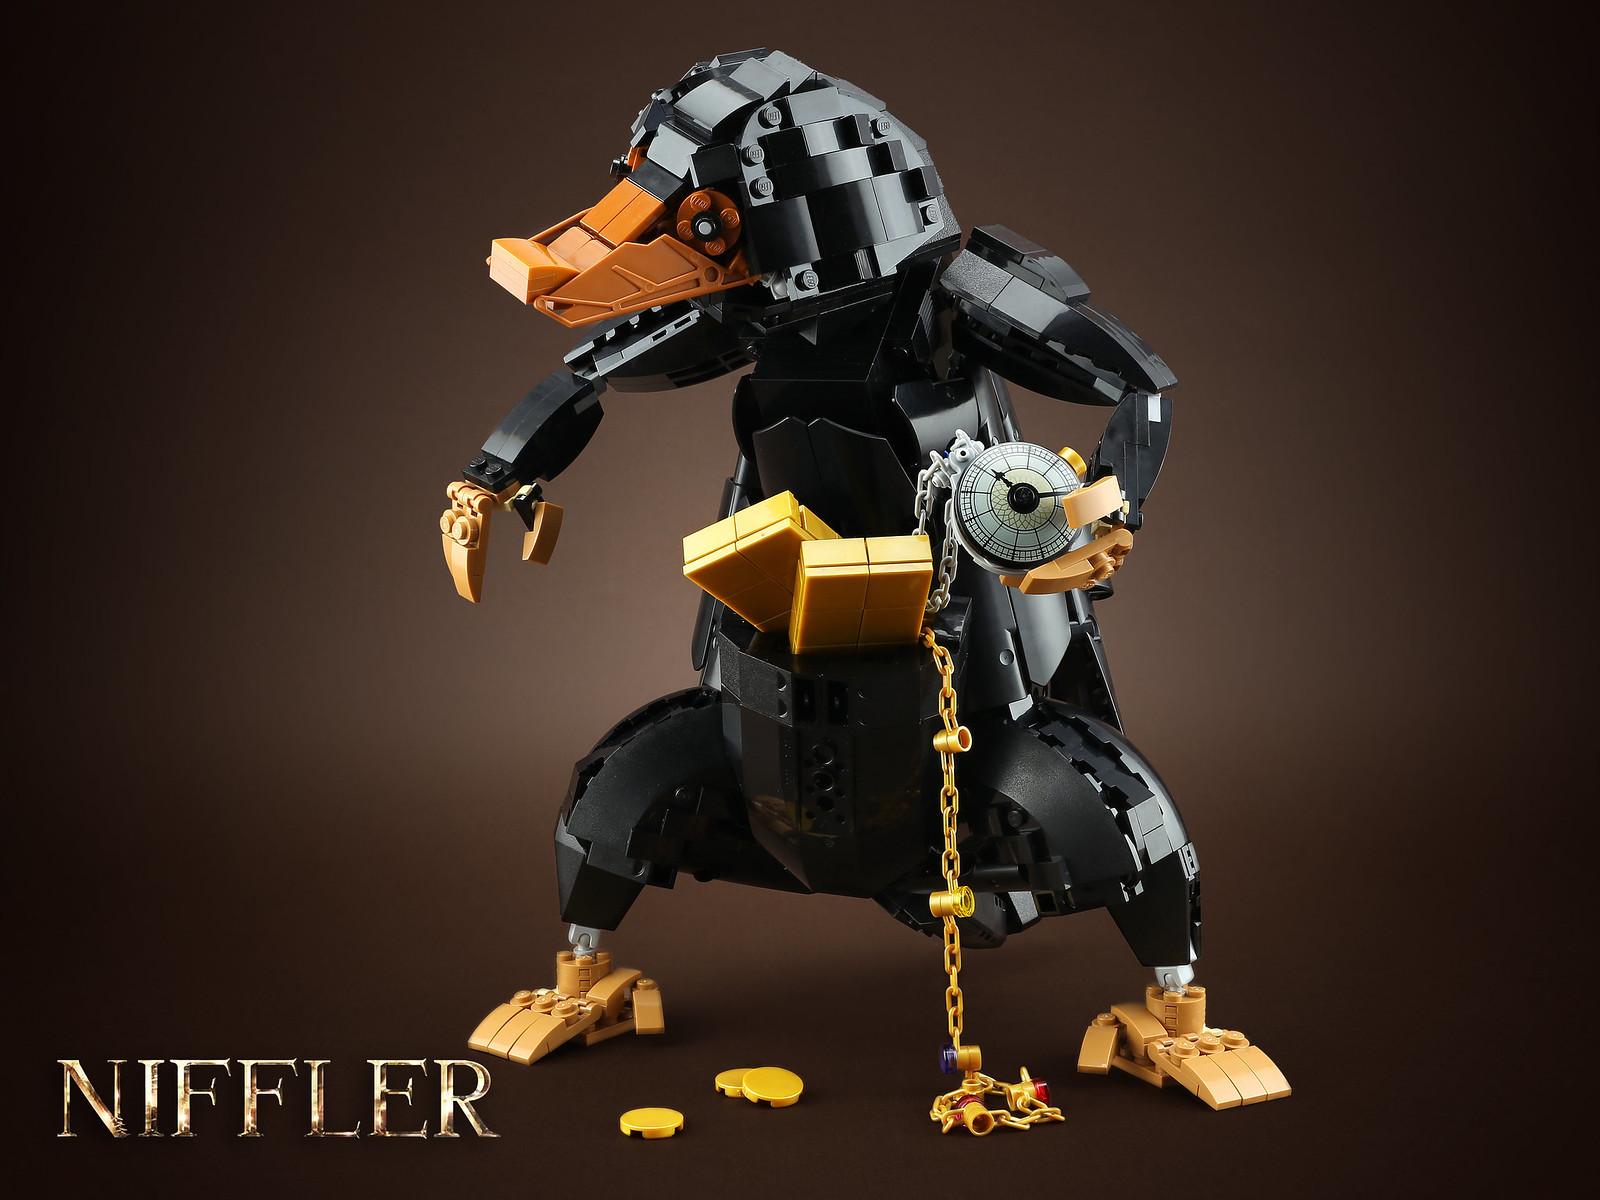 niffler lego moc